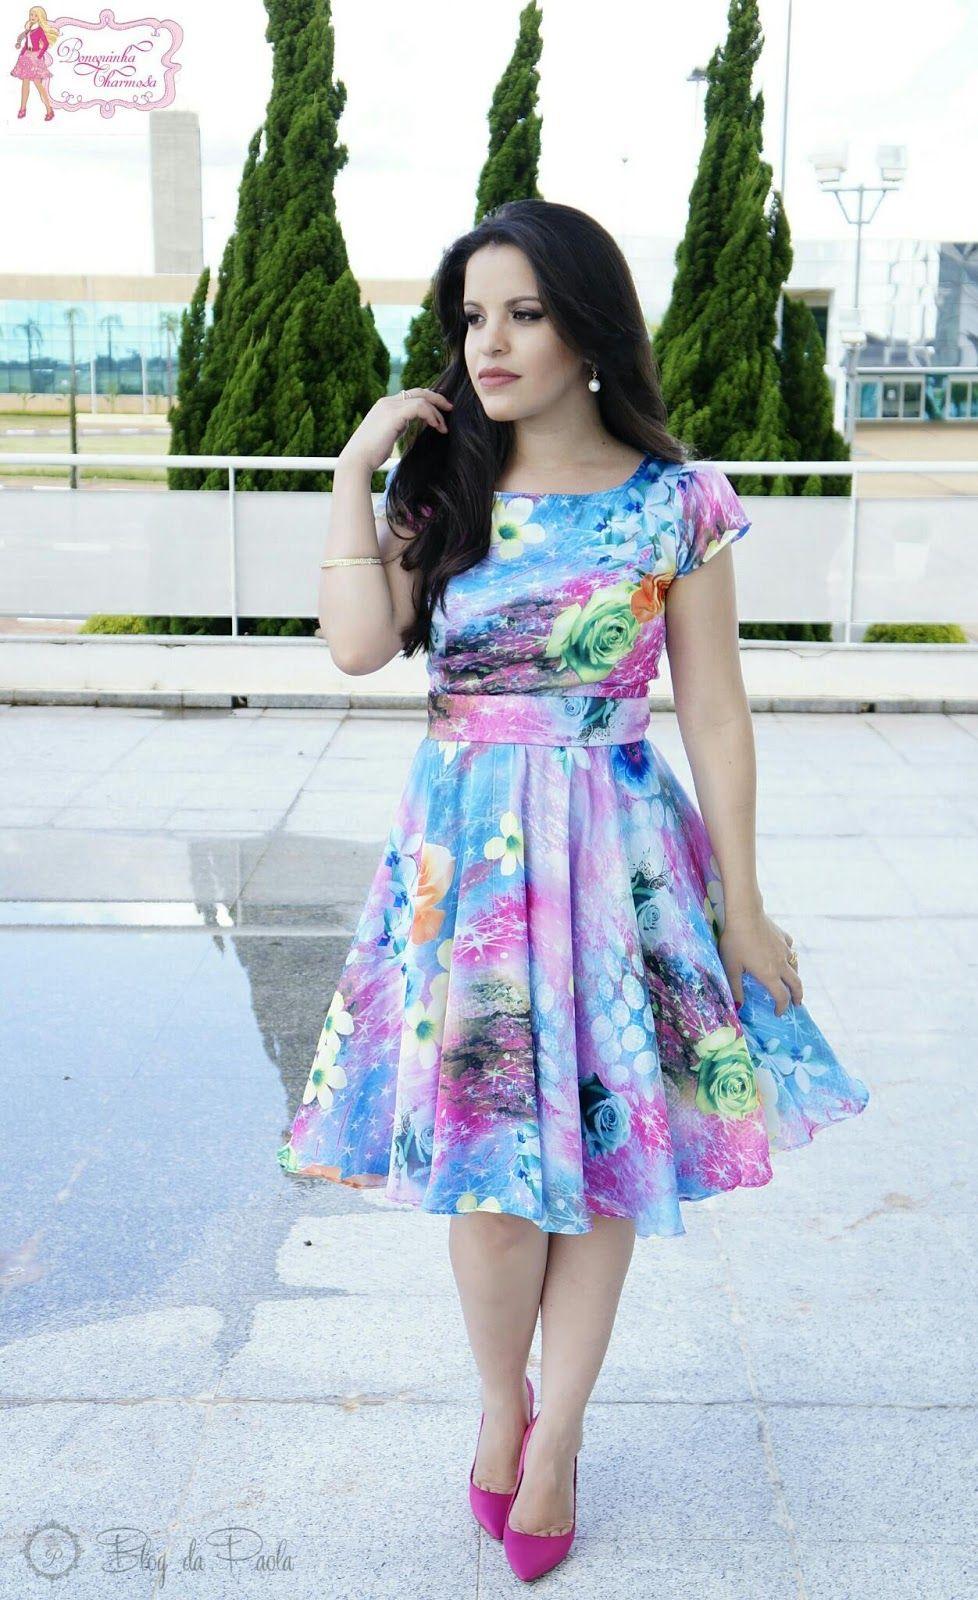 aa5e2f1034f Look do Dia  Vestido Lady Like - Bonequinha Charmosa